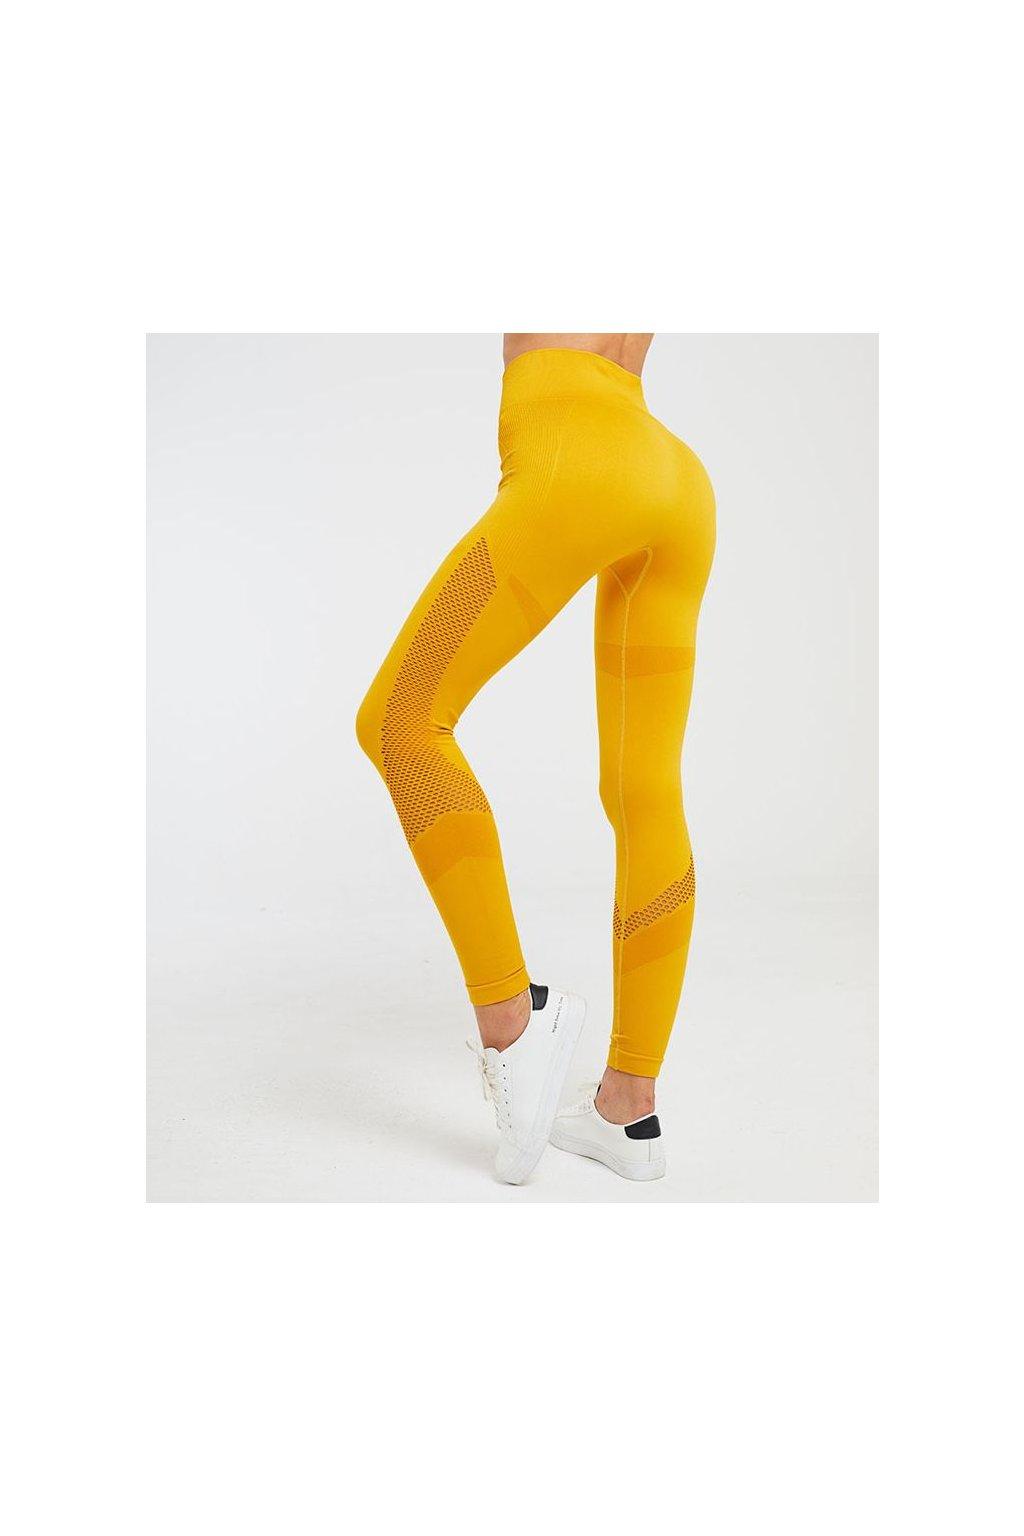 Dámské legíny Jenna seamless žluté